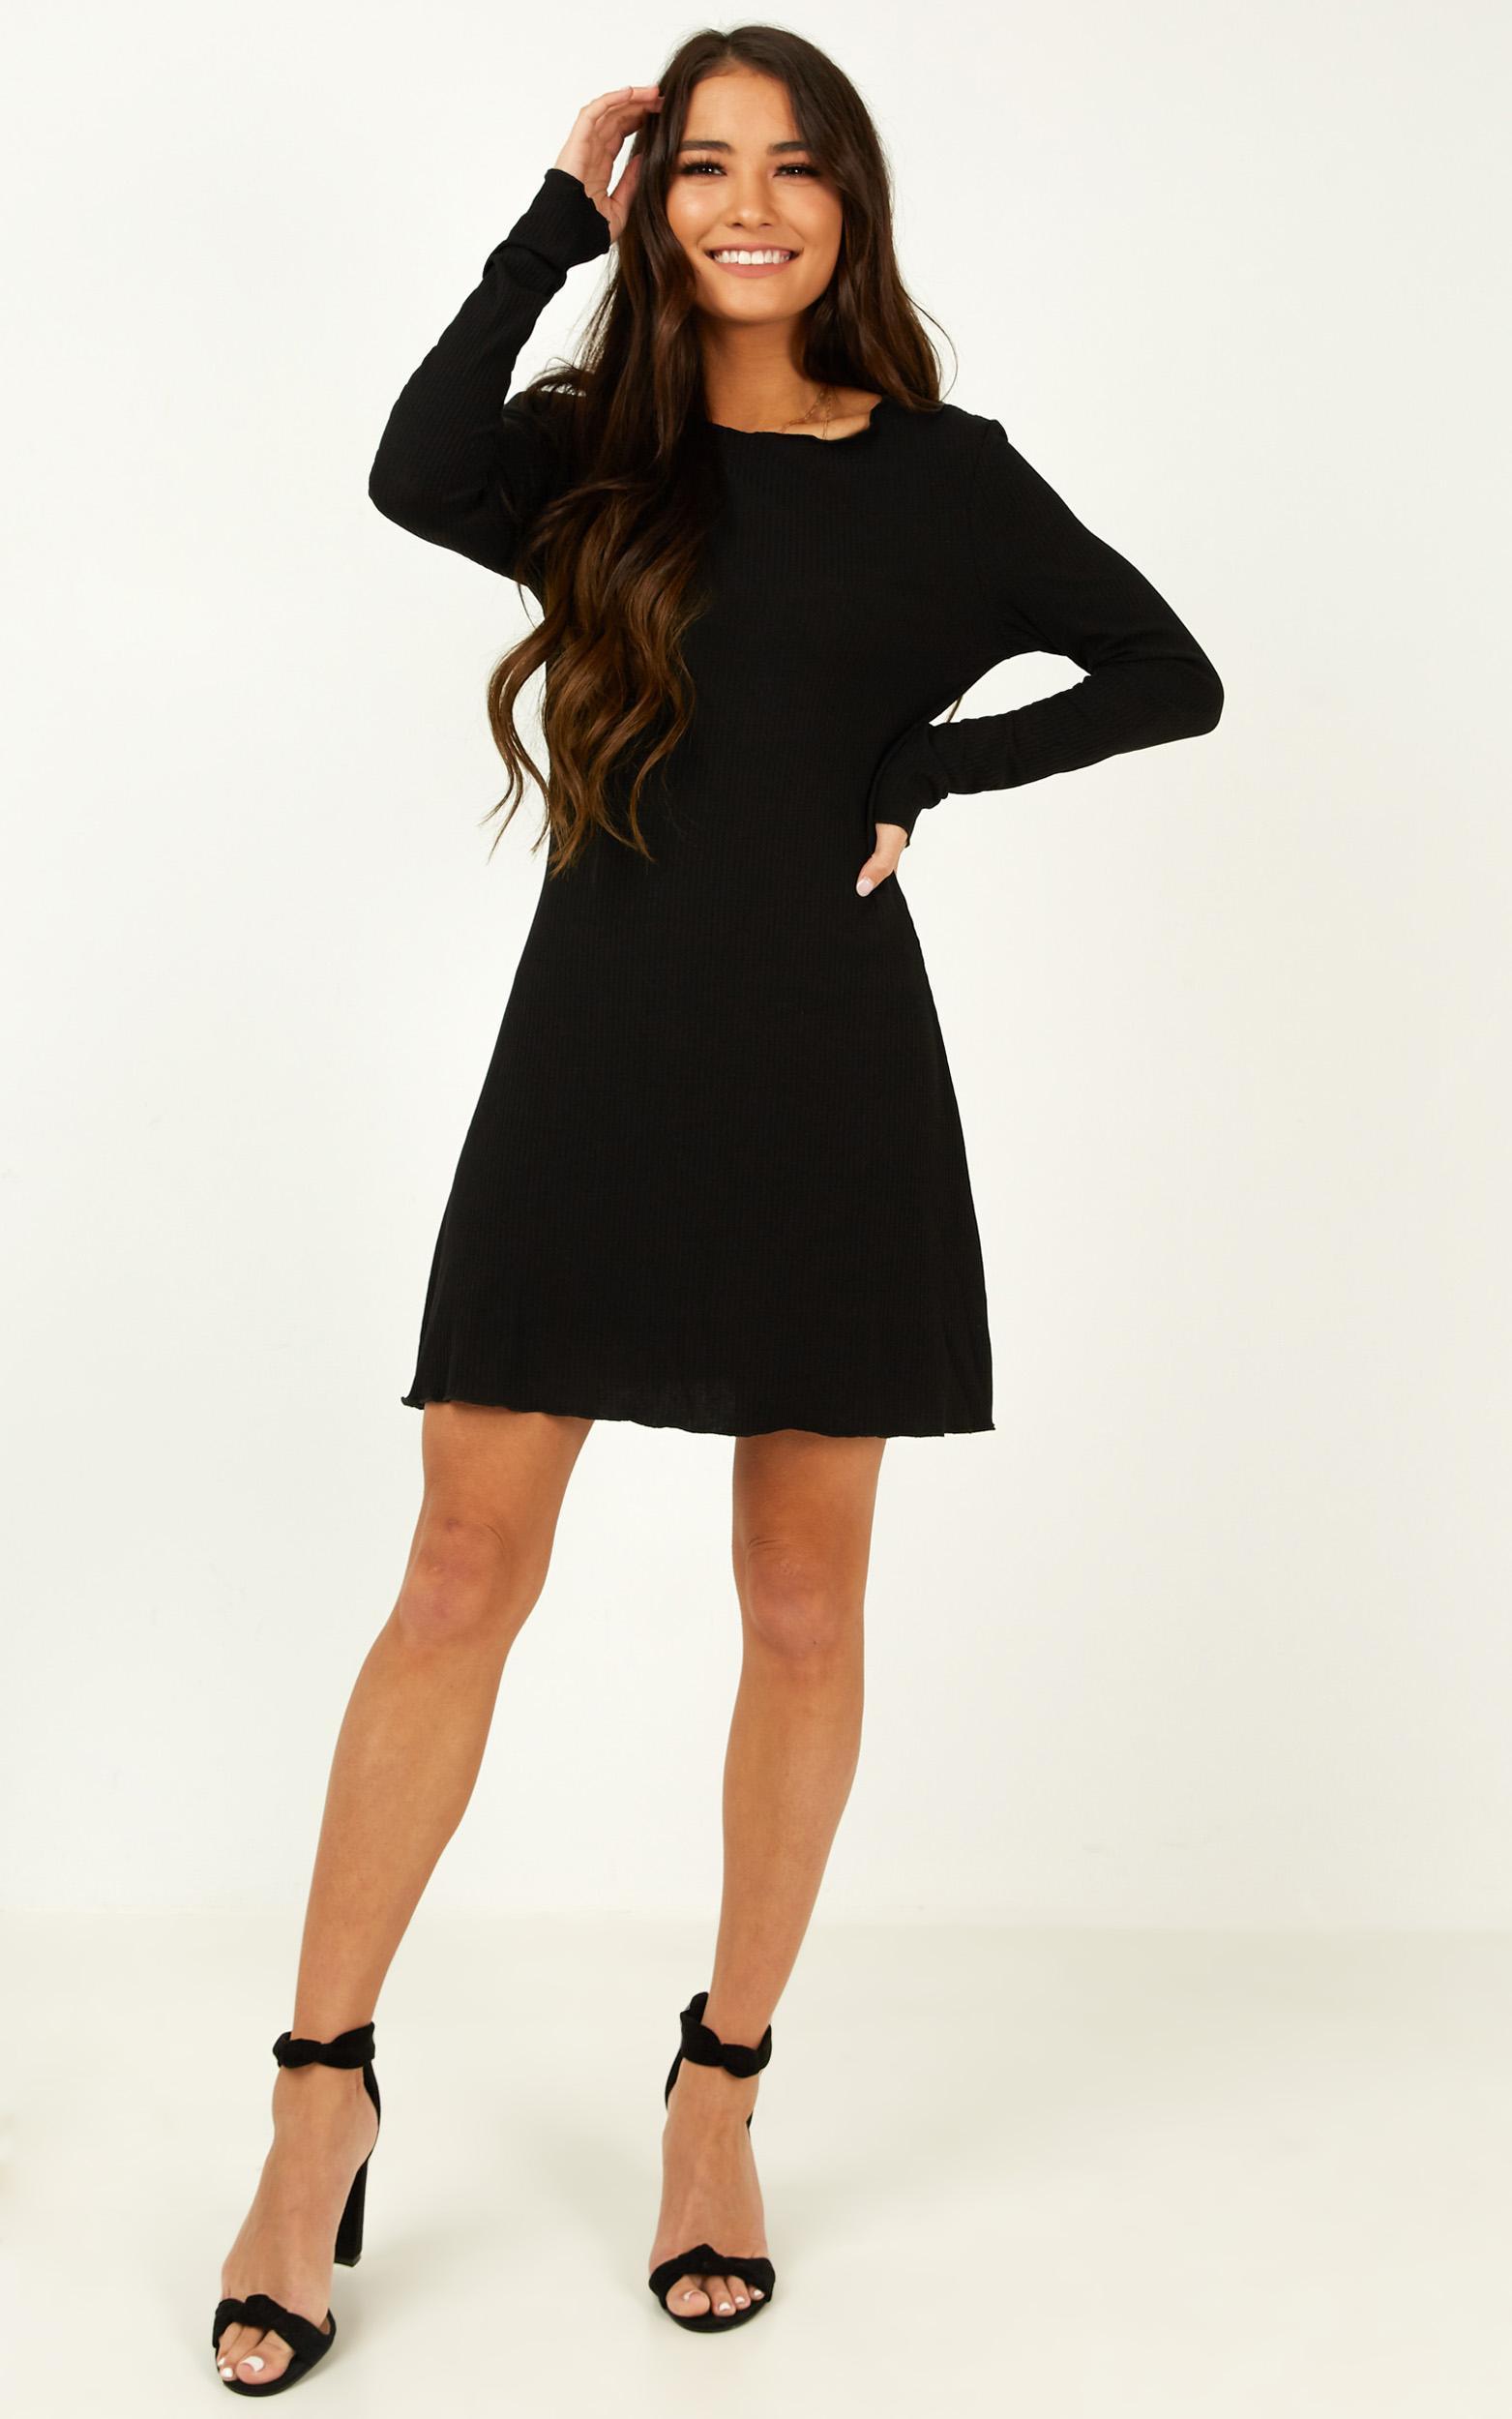 Feeling New Dress in black - 14 (XL), Black, hi-res image number null